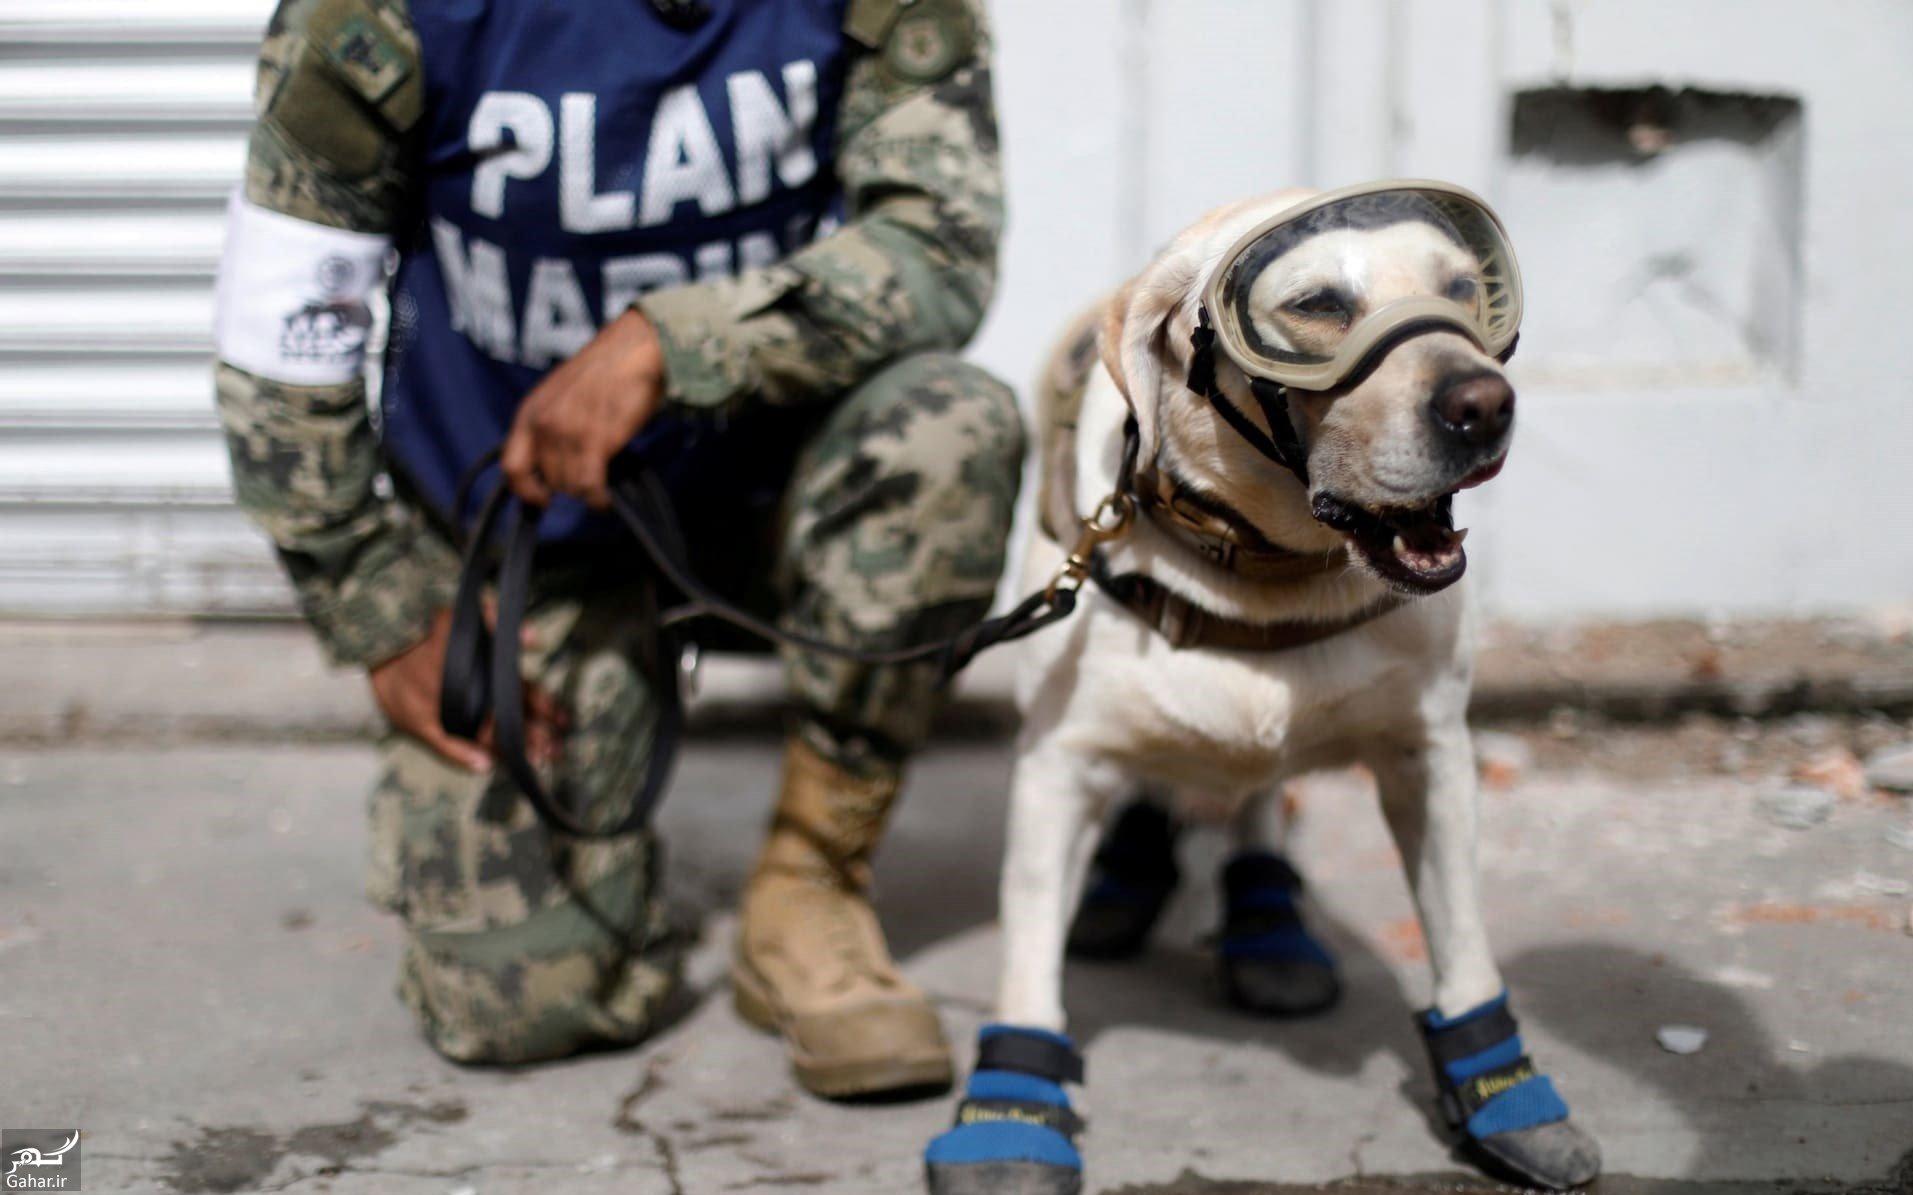 mataleb www.gahar .ir 05.10.97 7 سگ های زنده یاب چگونه فعالیت می کنند؟